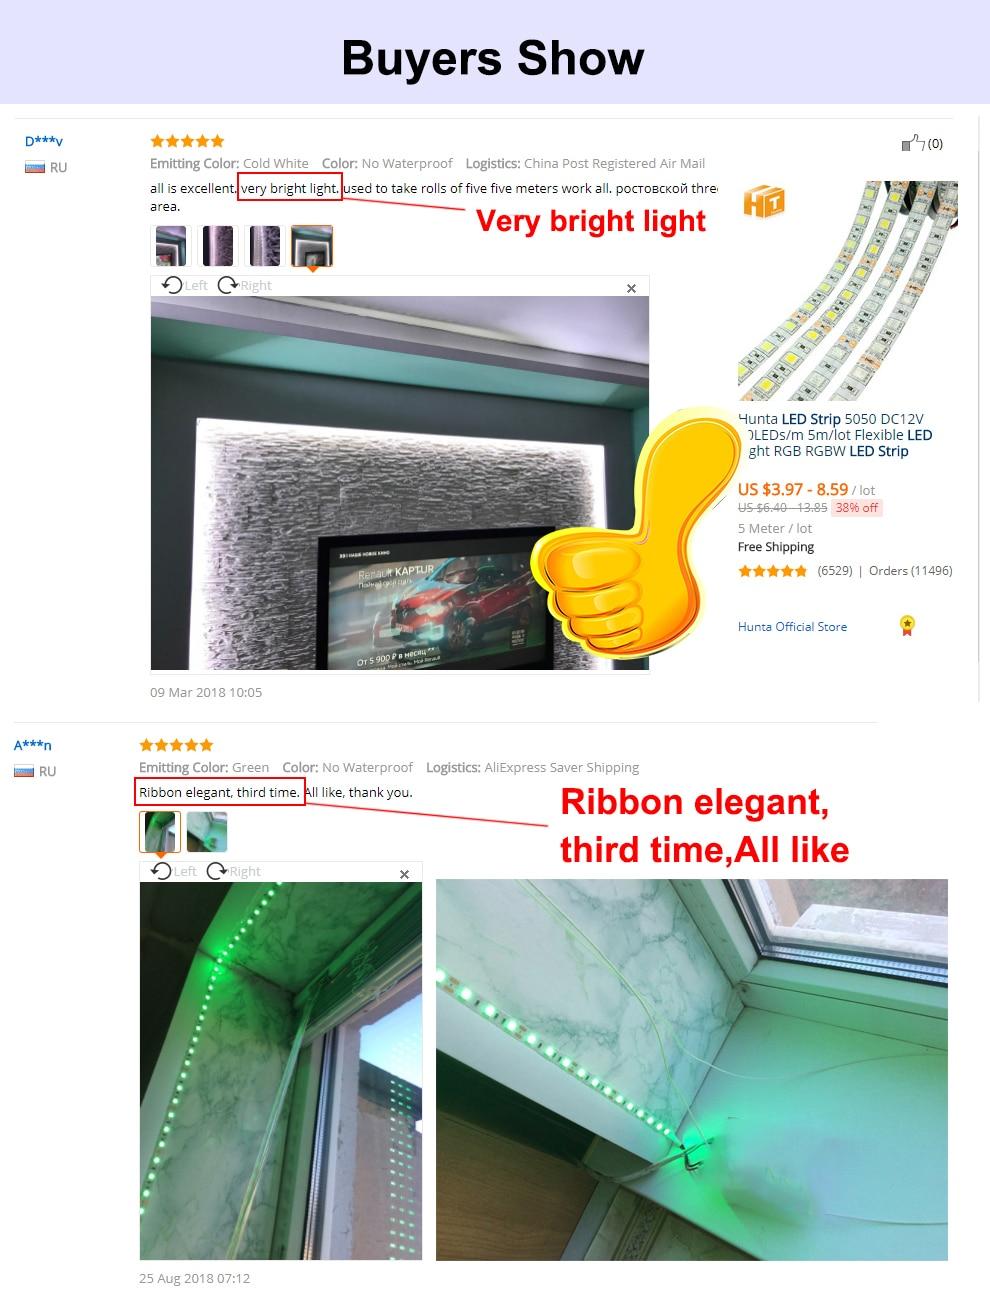 HTB1DCGvKaSWBuNjSsrbq6y0mVXa5 LED Strip 5050 DC12V 60LEDs/m Flexible LED Light RGB RGBW 5050 LED Strip 300LEDs 5m/lot